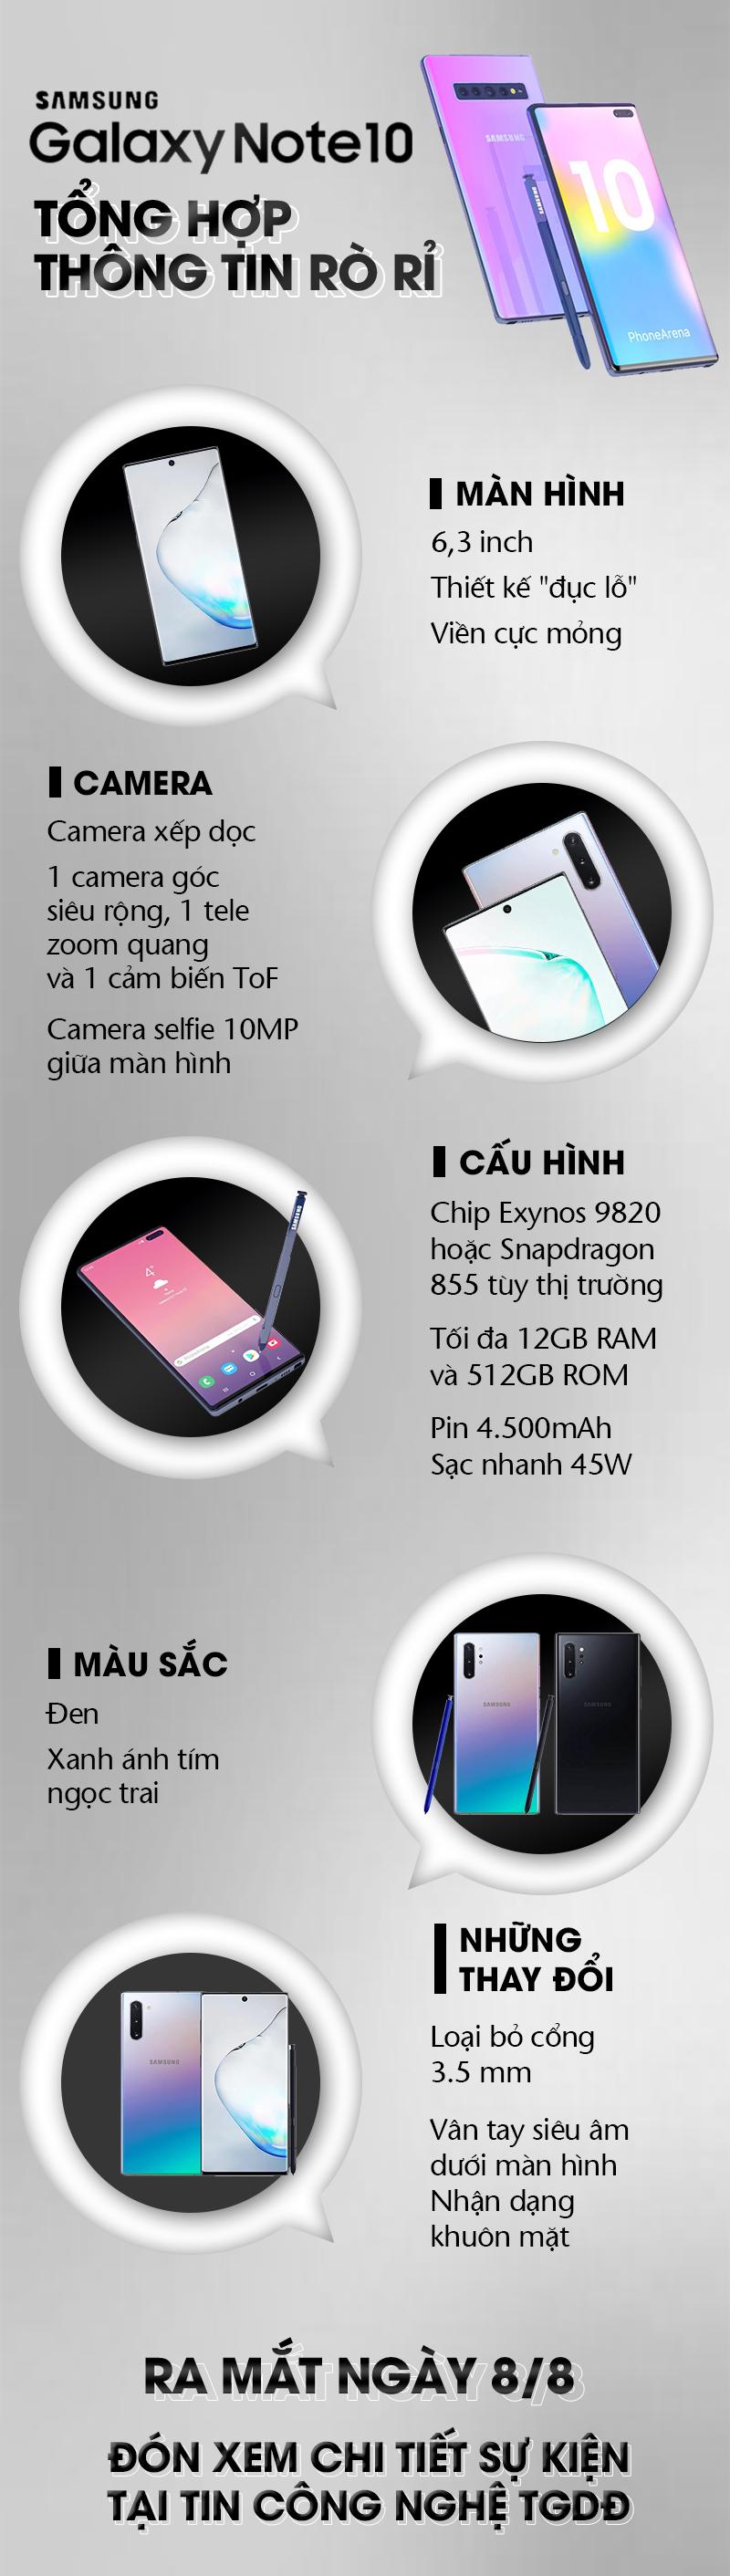 Samsung galaxy Note 10 ra mắt